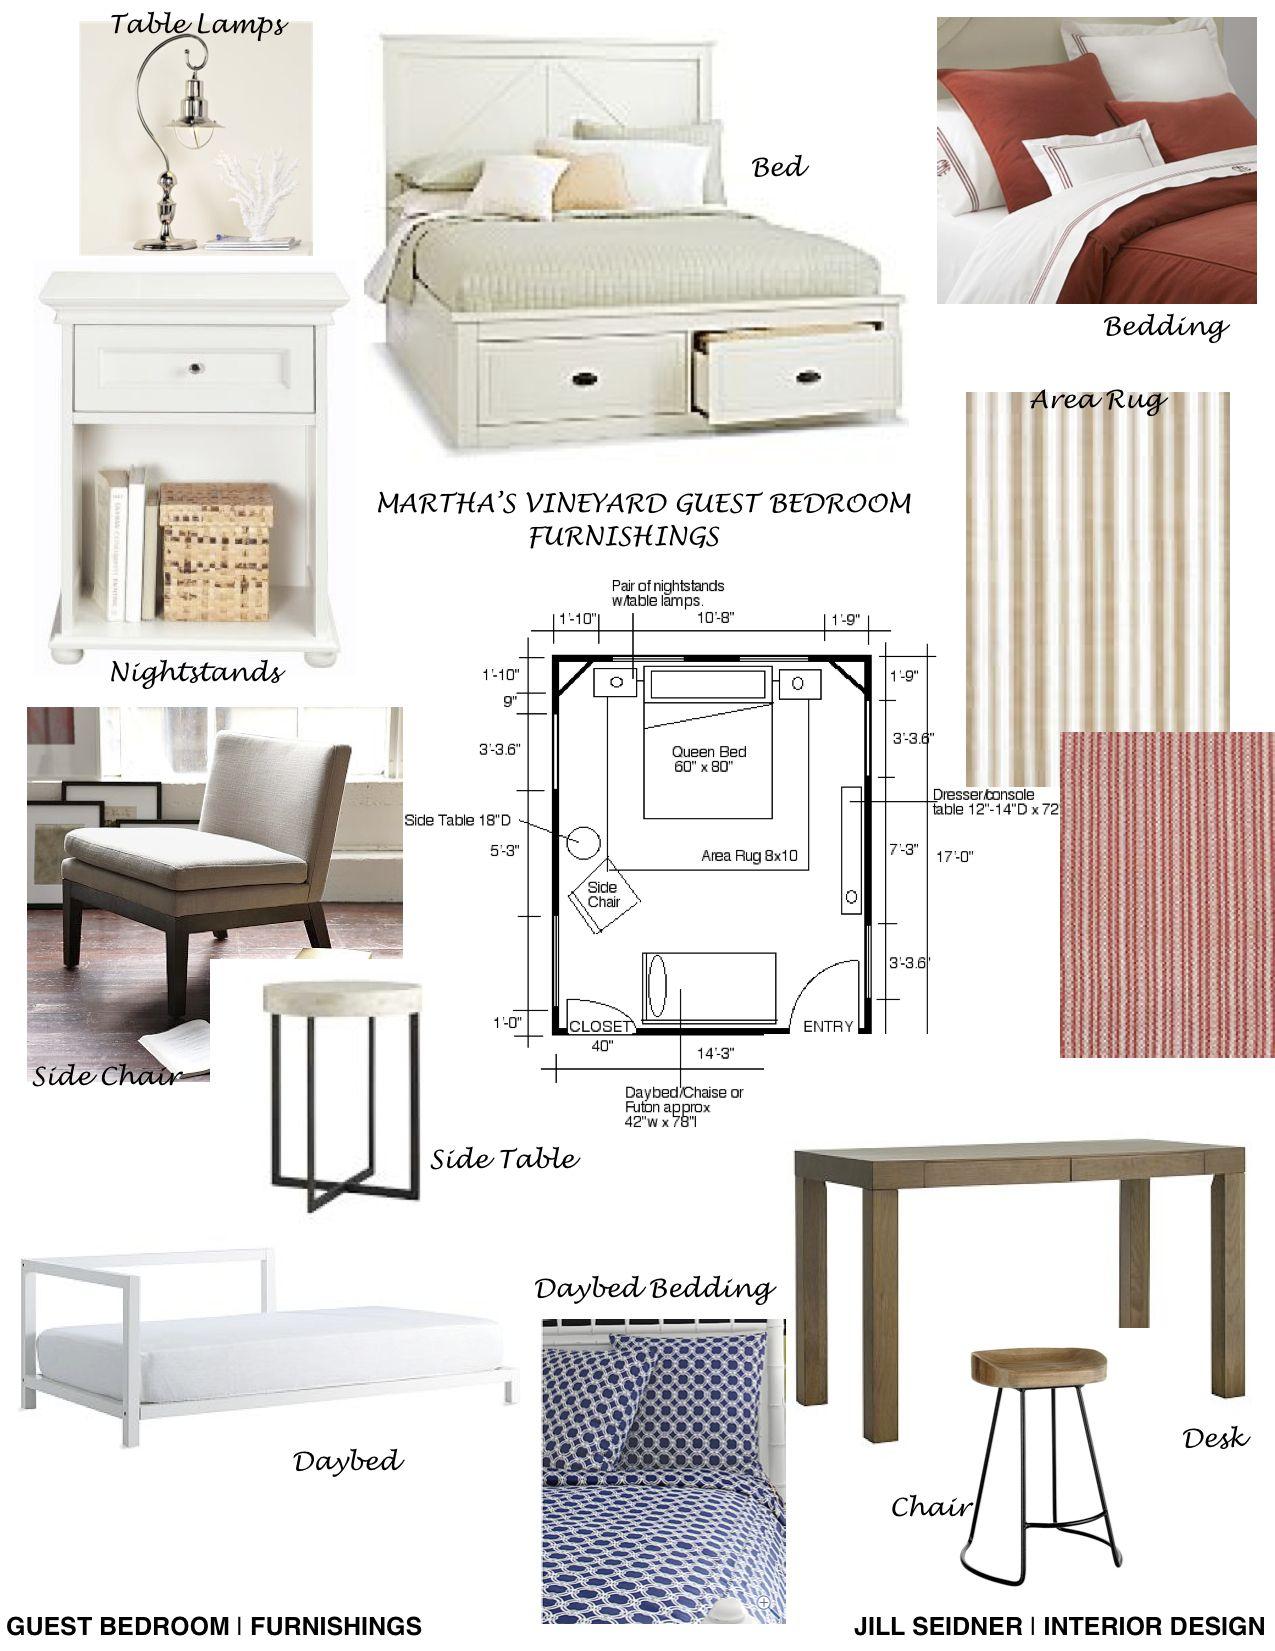 Online Room Remodel Design: Furnishings Concept Board For An Online Design Project